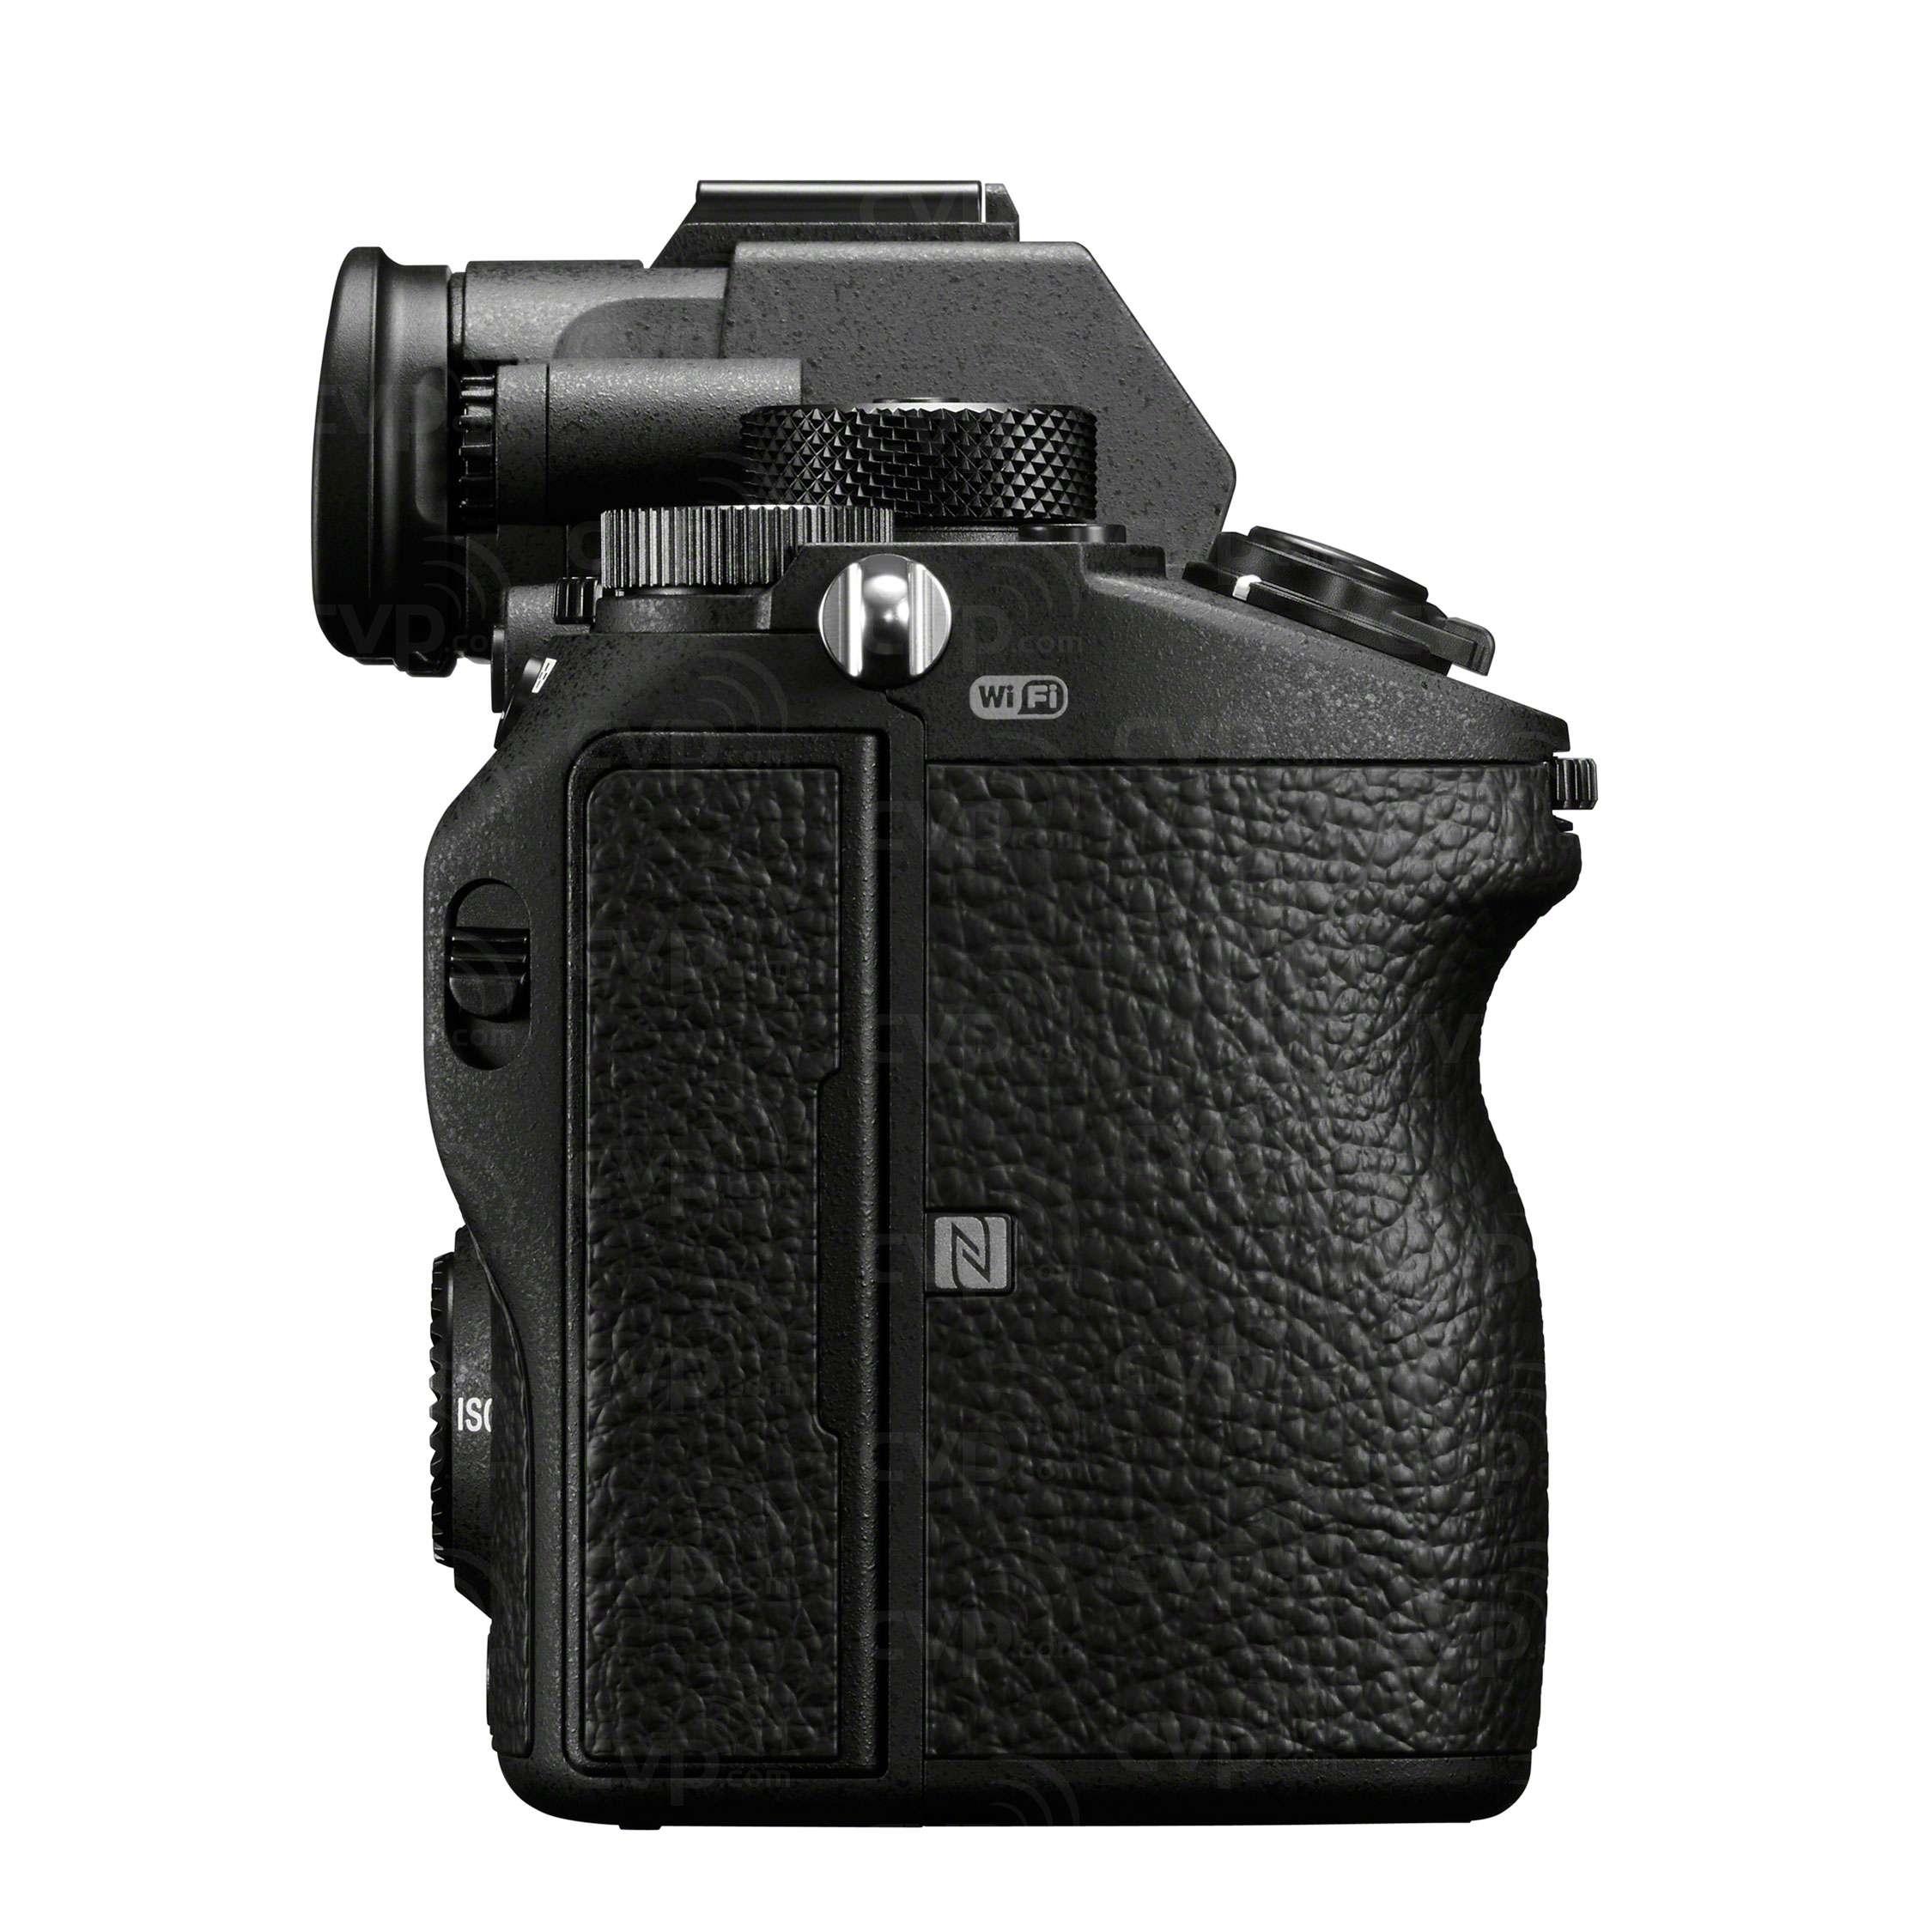 Sony a7R III Camera Body Only